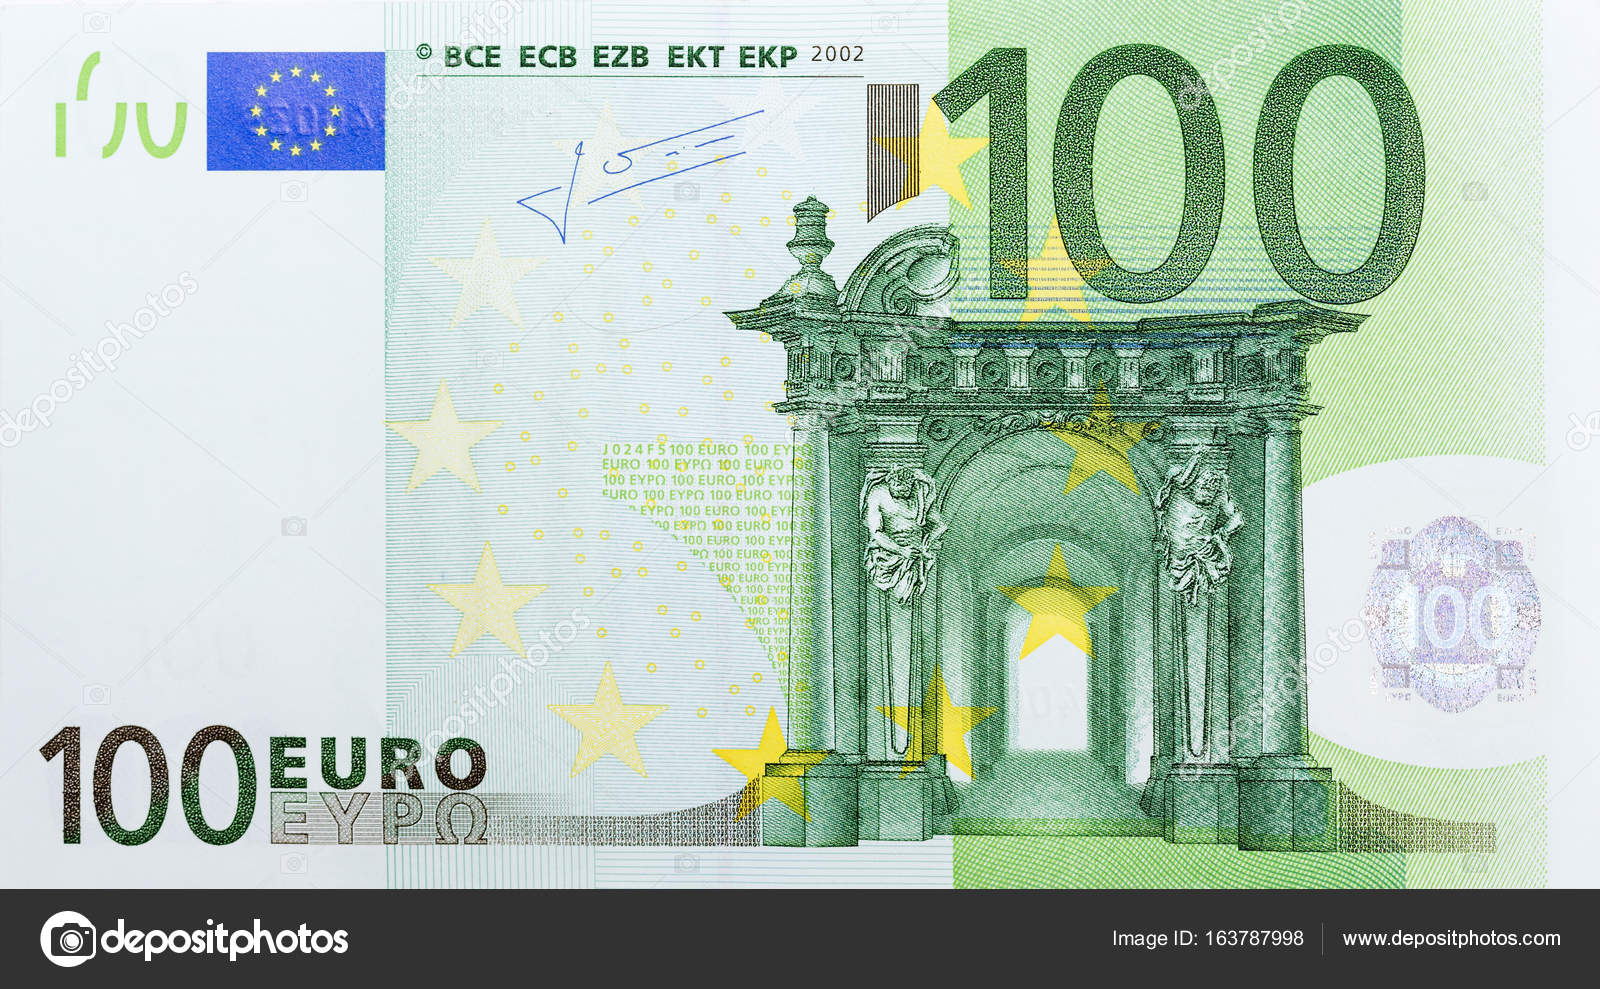 Notas de 100 euro fotografias de stock yamabikay for Sitzkissen gunstig 1 euro